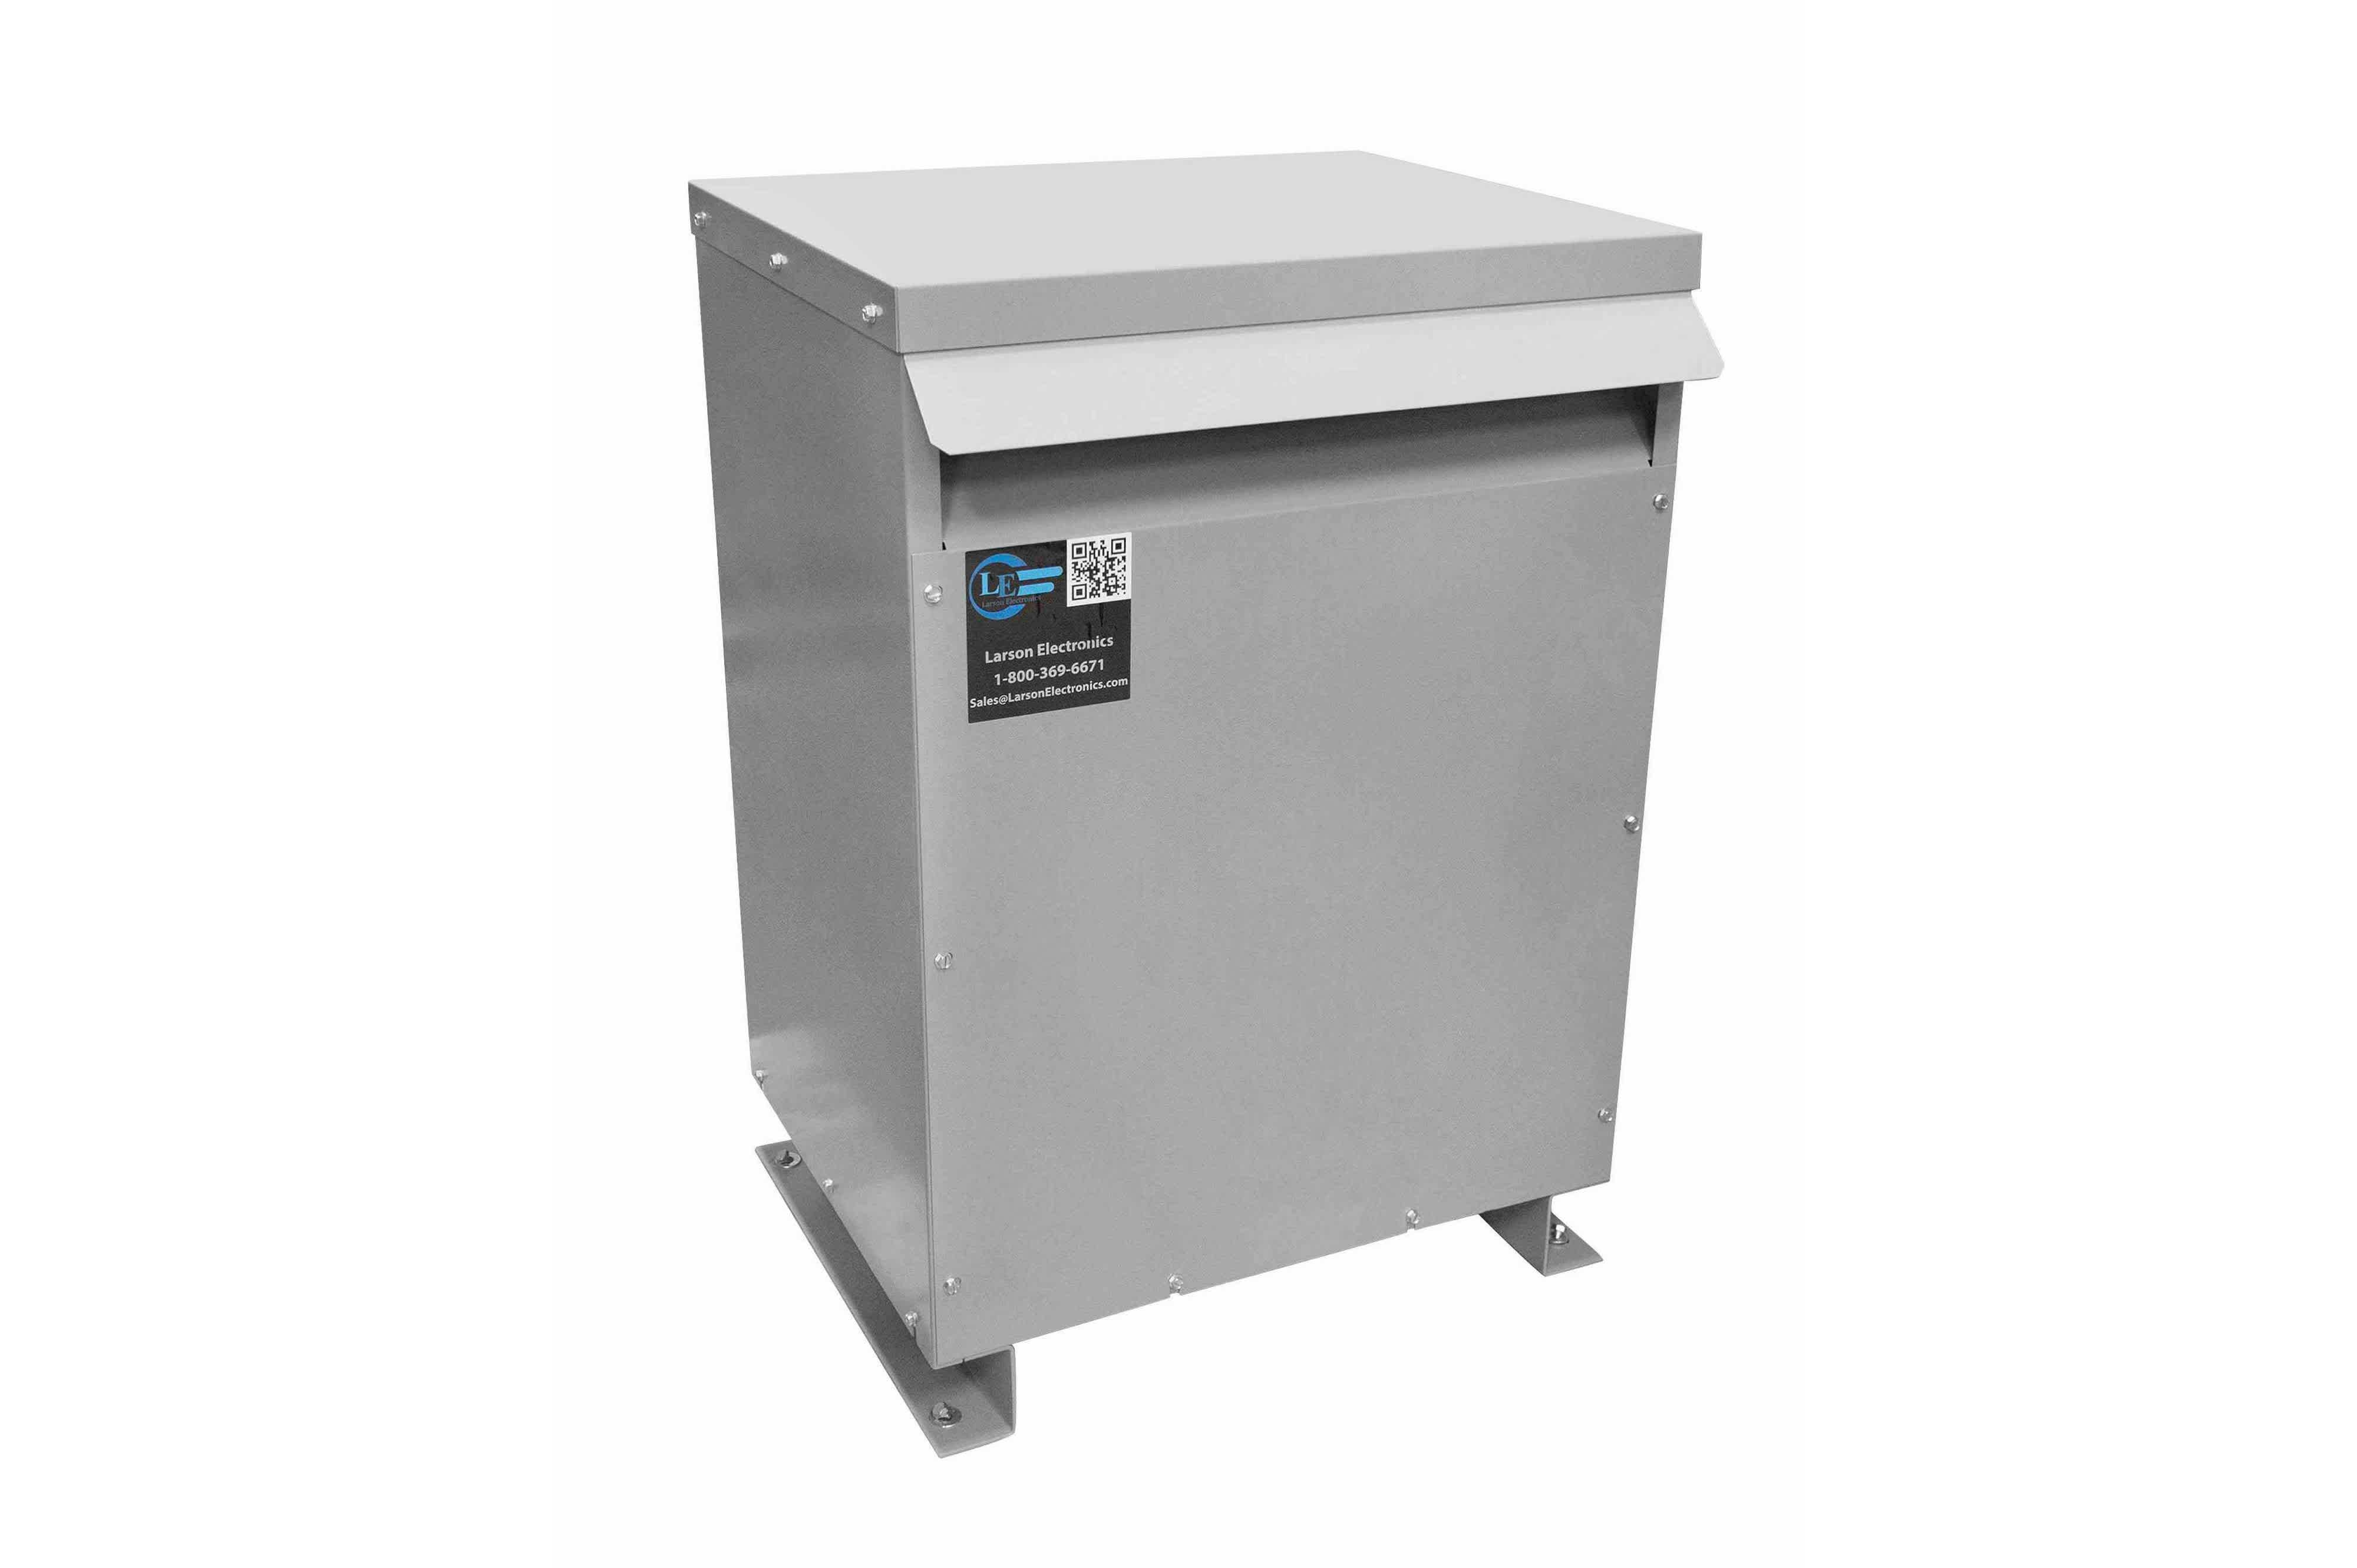 27 kVA 3PH Isolation Transformer, 480V Wye Primary, 240V Delta Secondary, N3R, Ventilated, 60 Hz